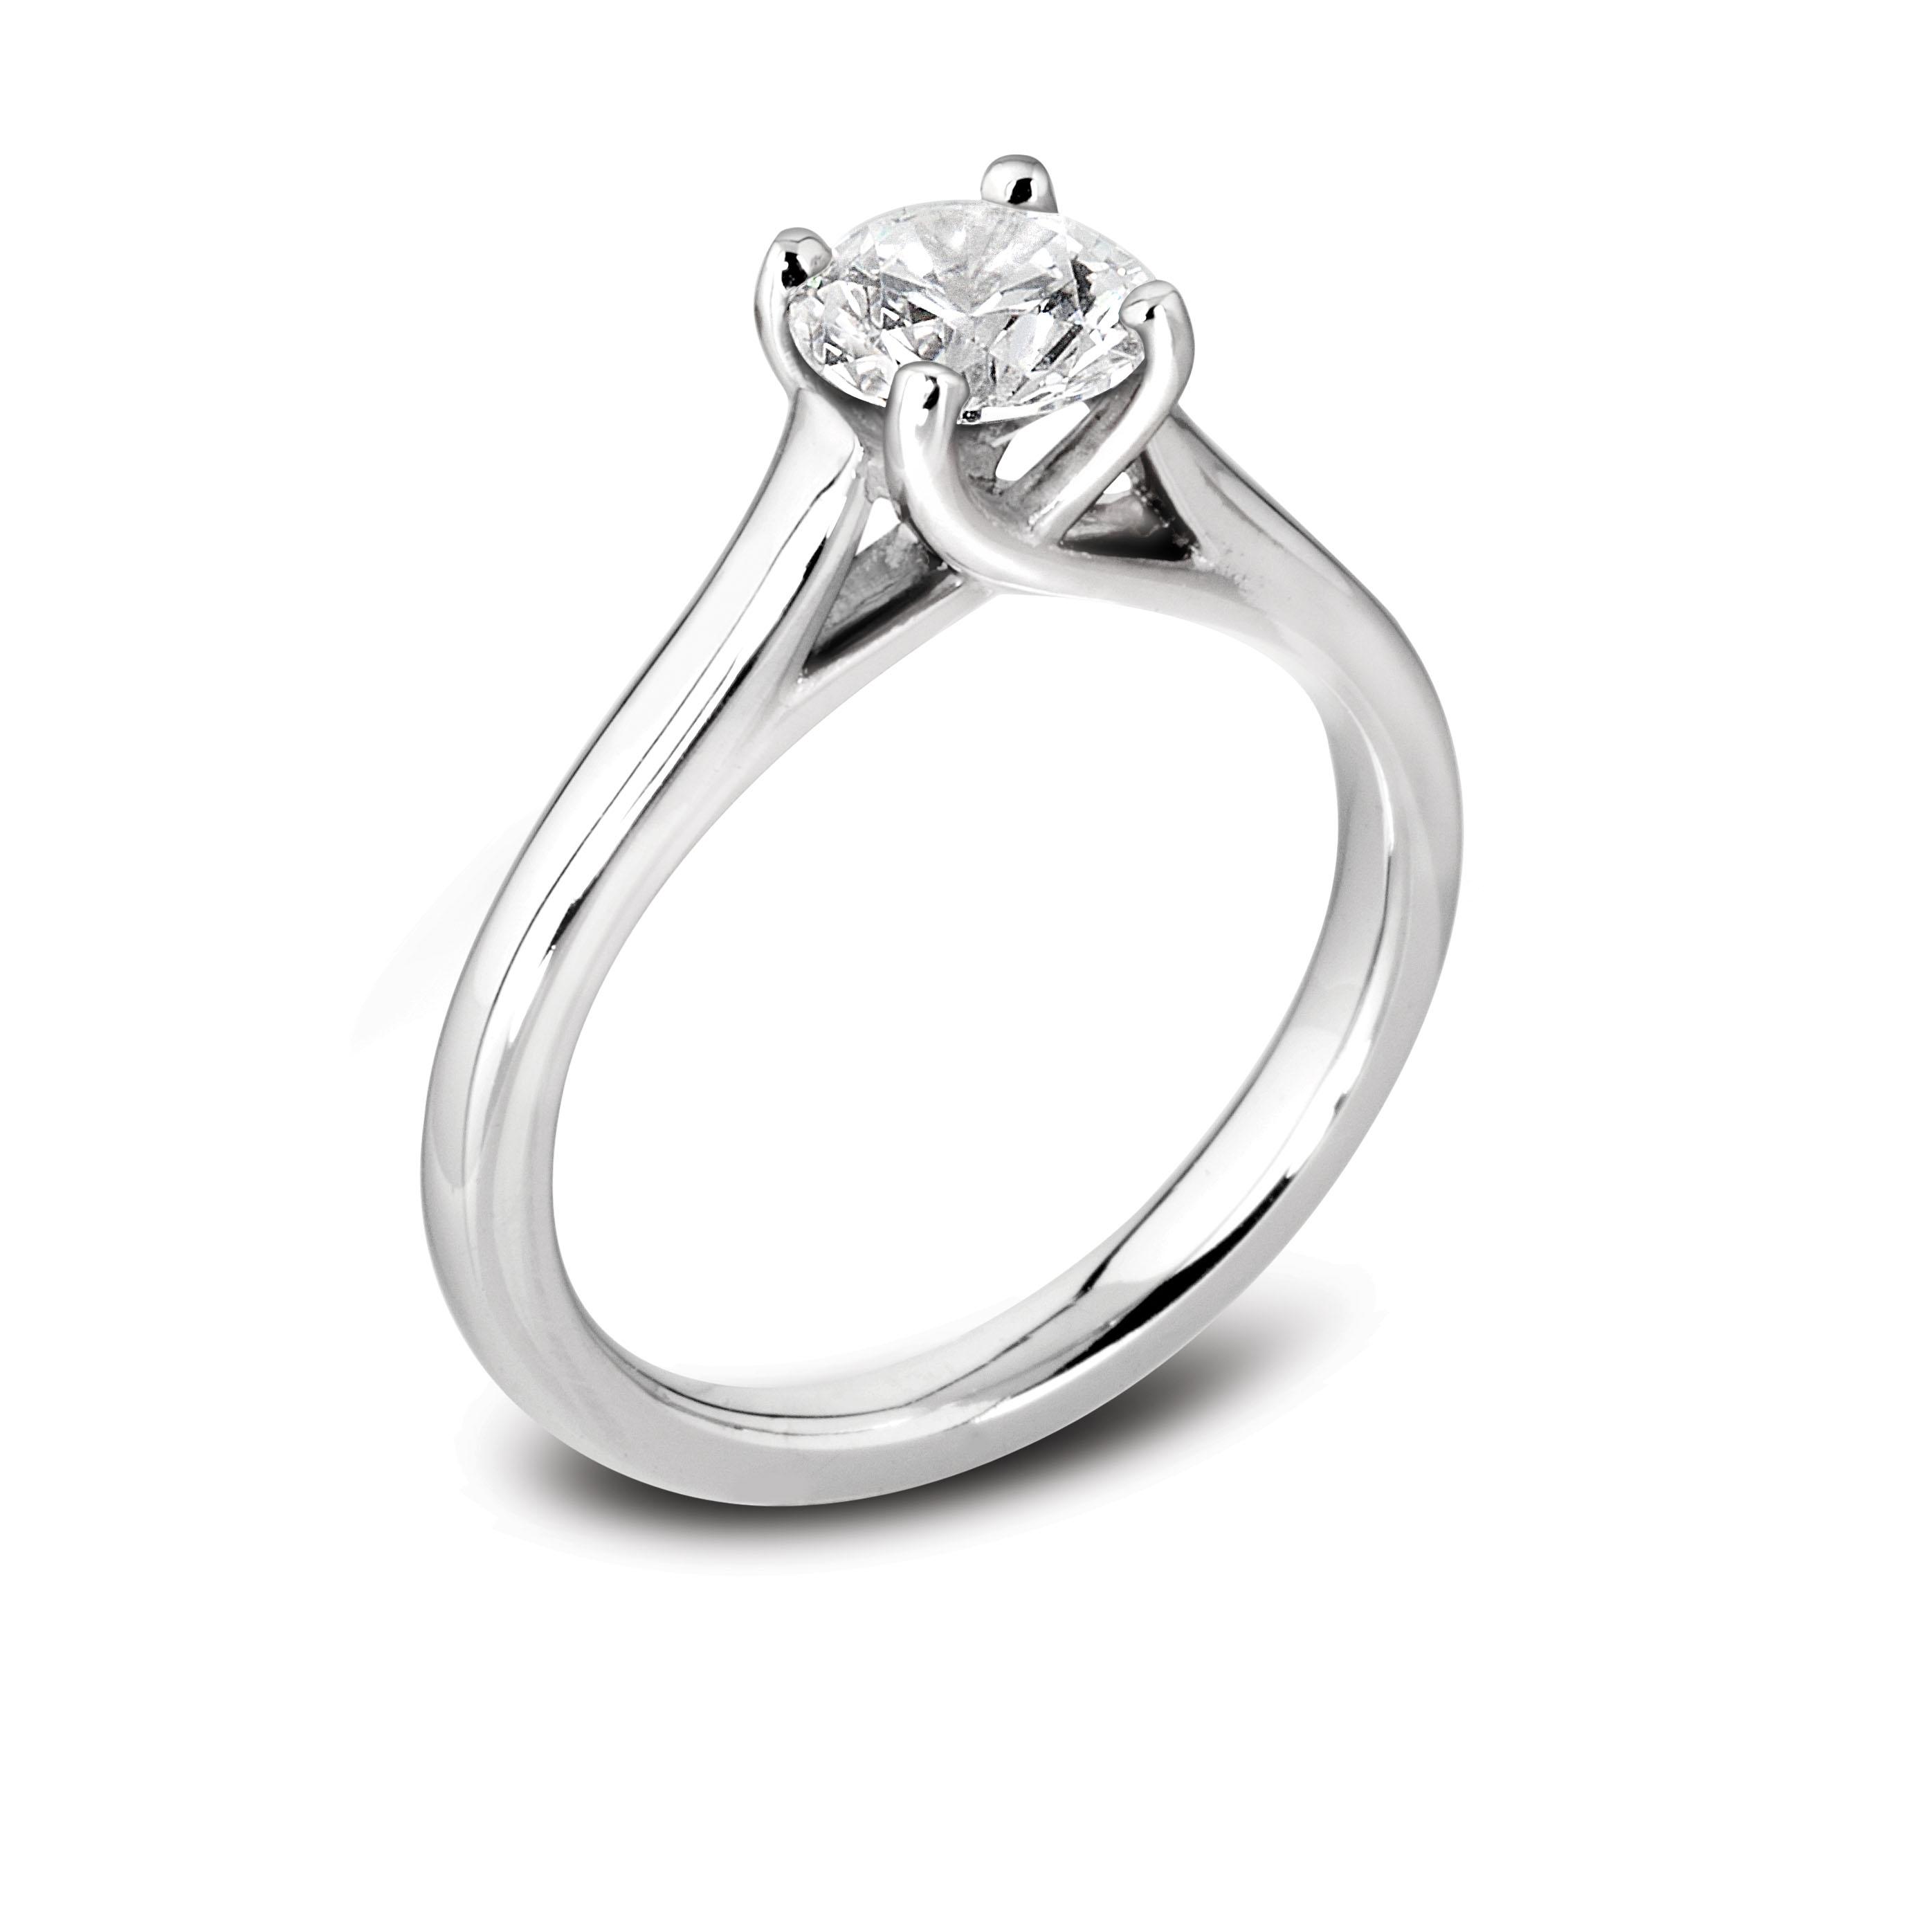 Brilliant Cut Diamond Solitaire Ring in 18ct White Gold